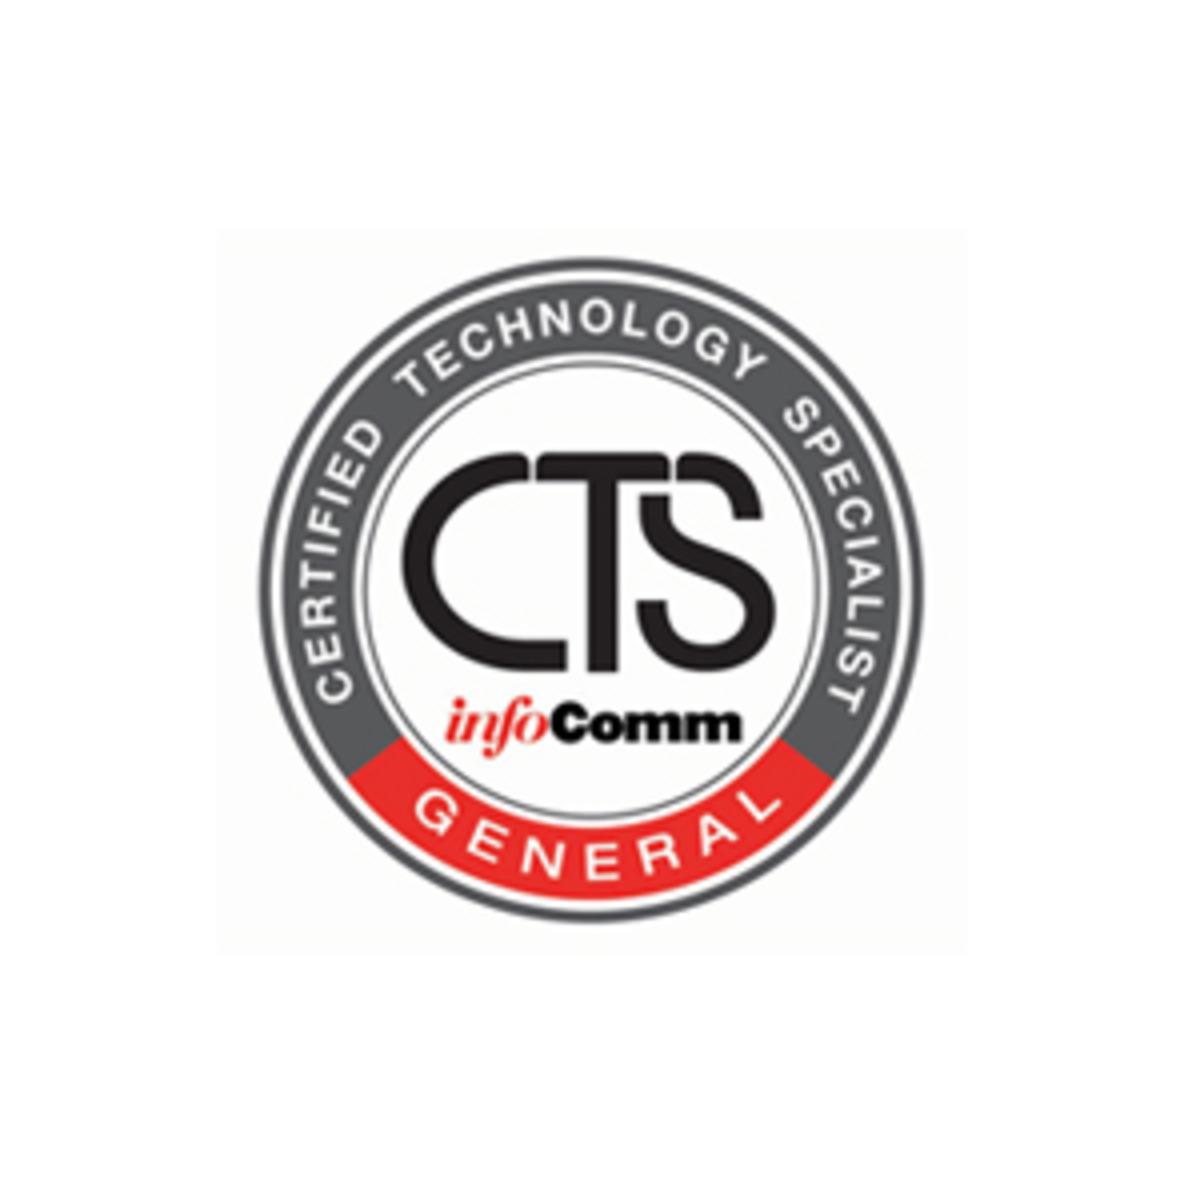 CTS.jpg